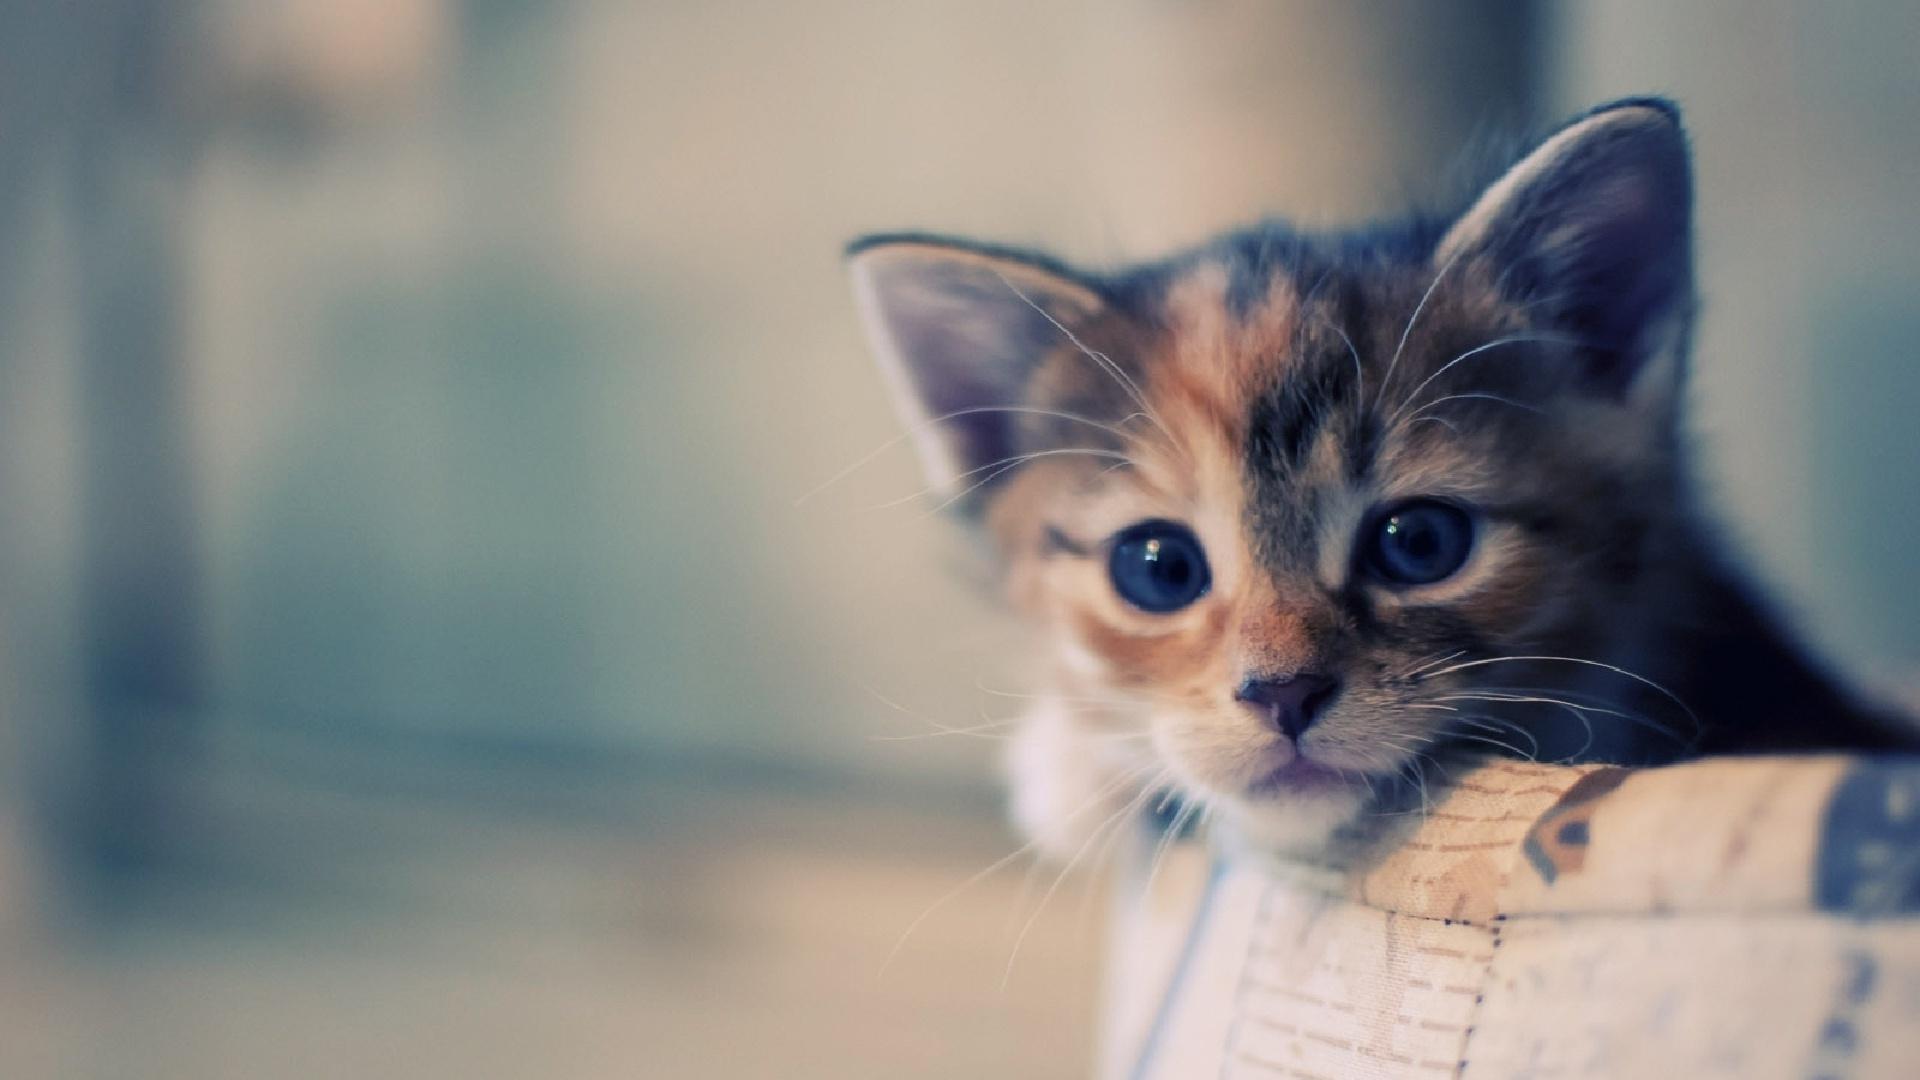 35 1920x1080 cat wallpaper on wallpapersafari - Cute kittens hd wallpaper free download ...